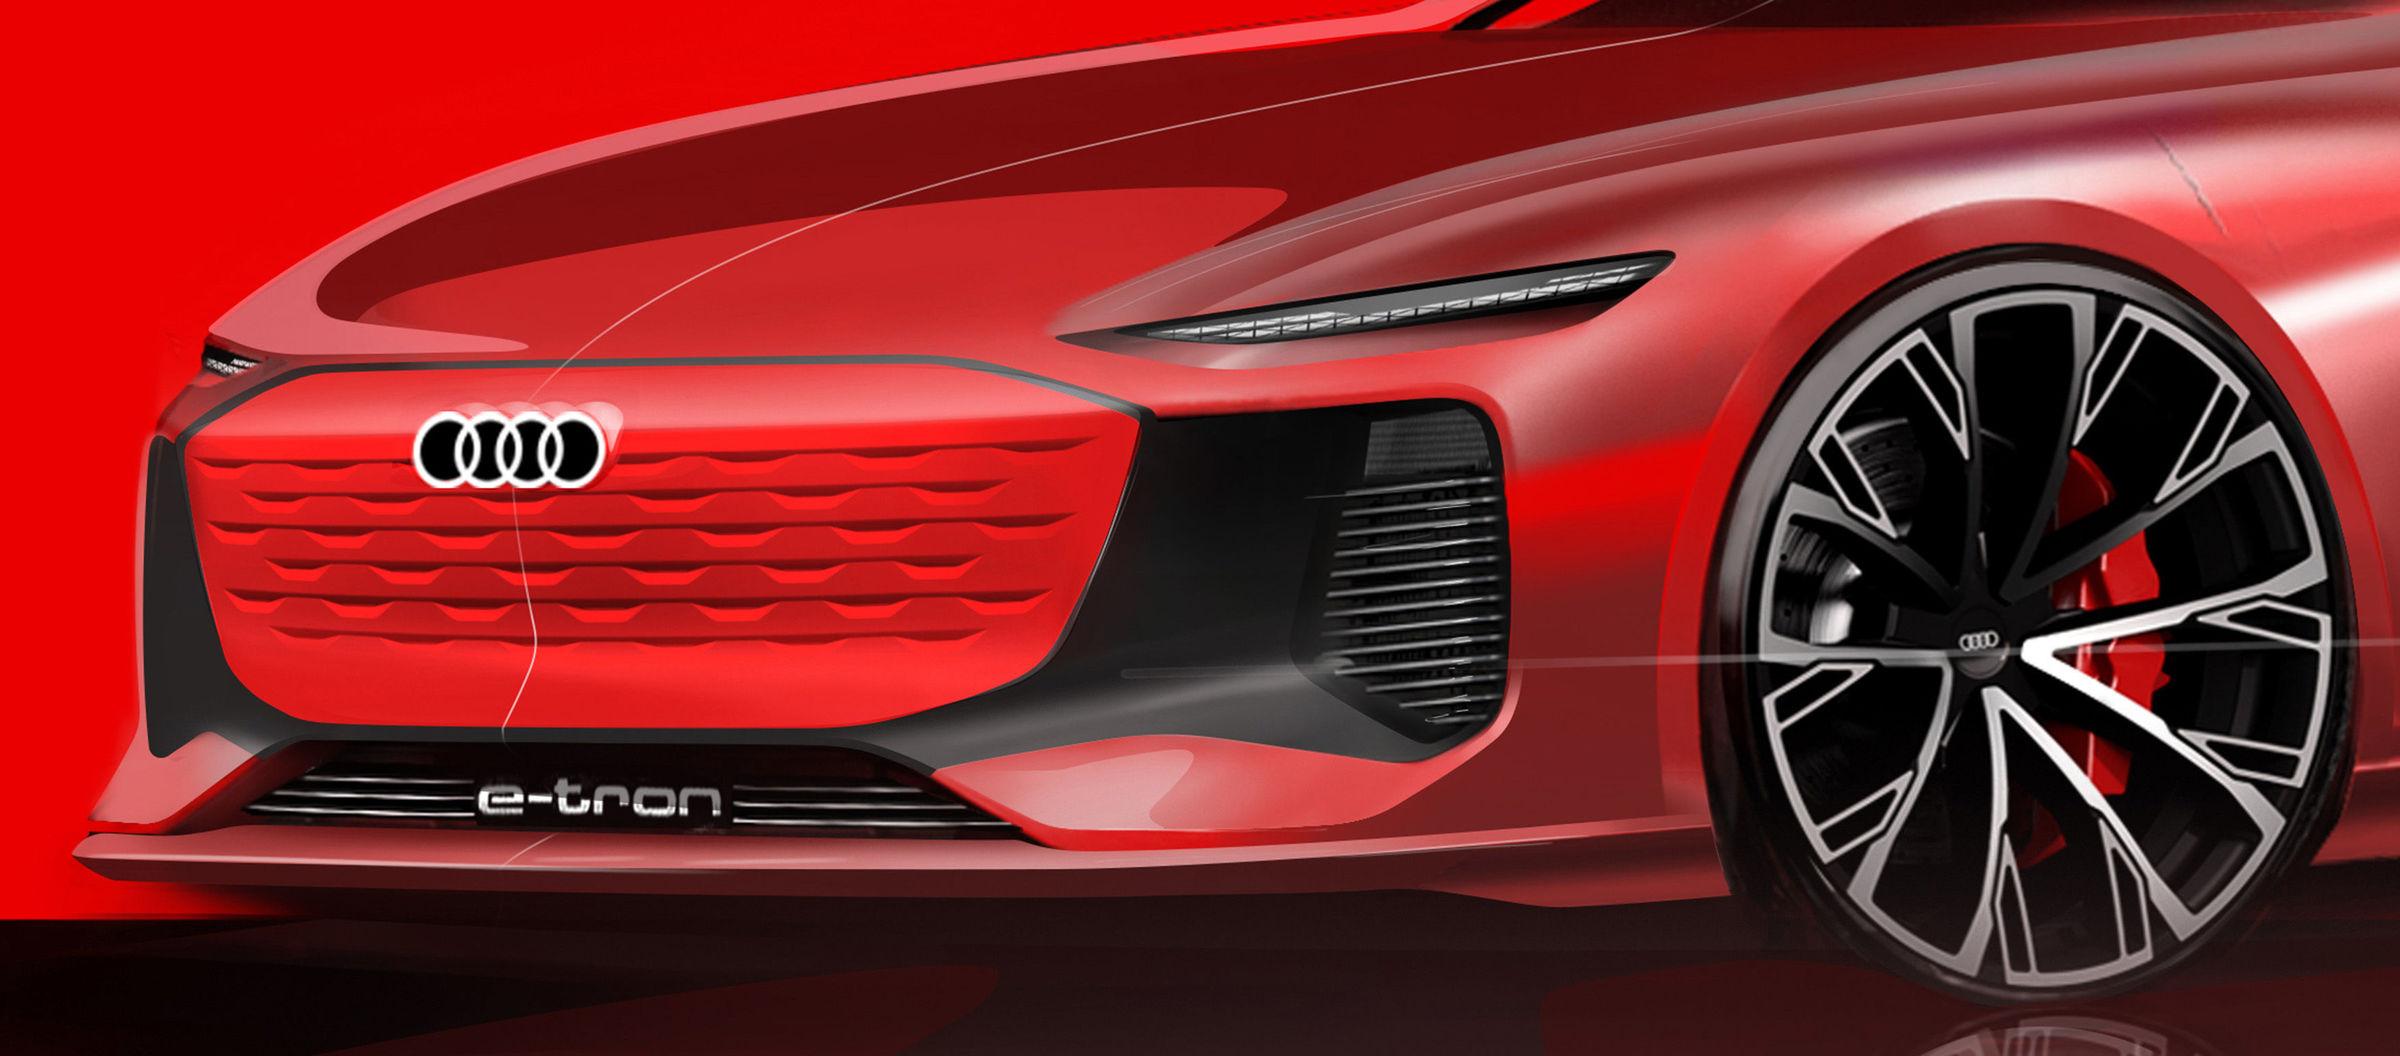 World premiere: Audi at Auto Shanghai on April 19